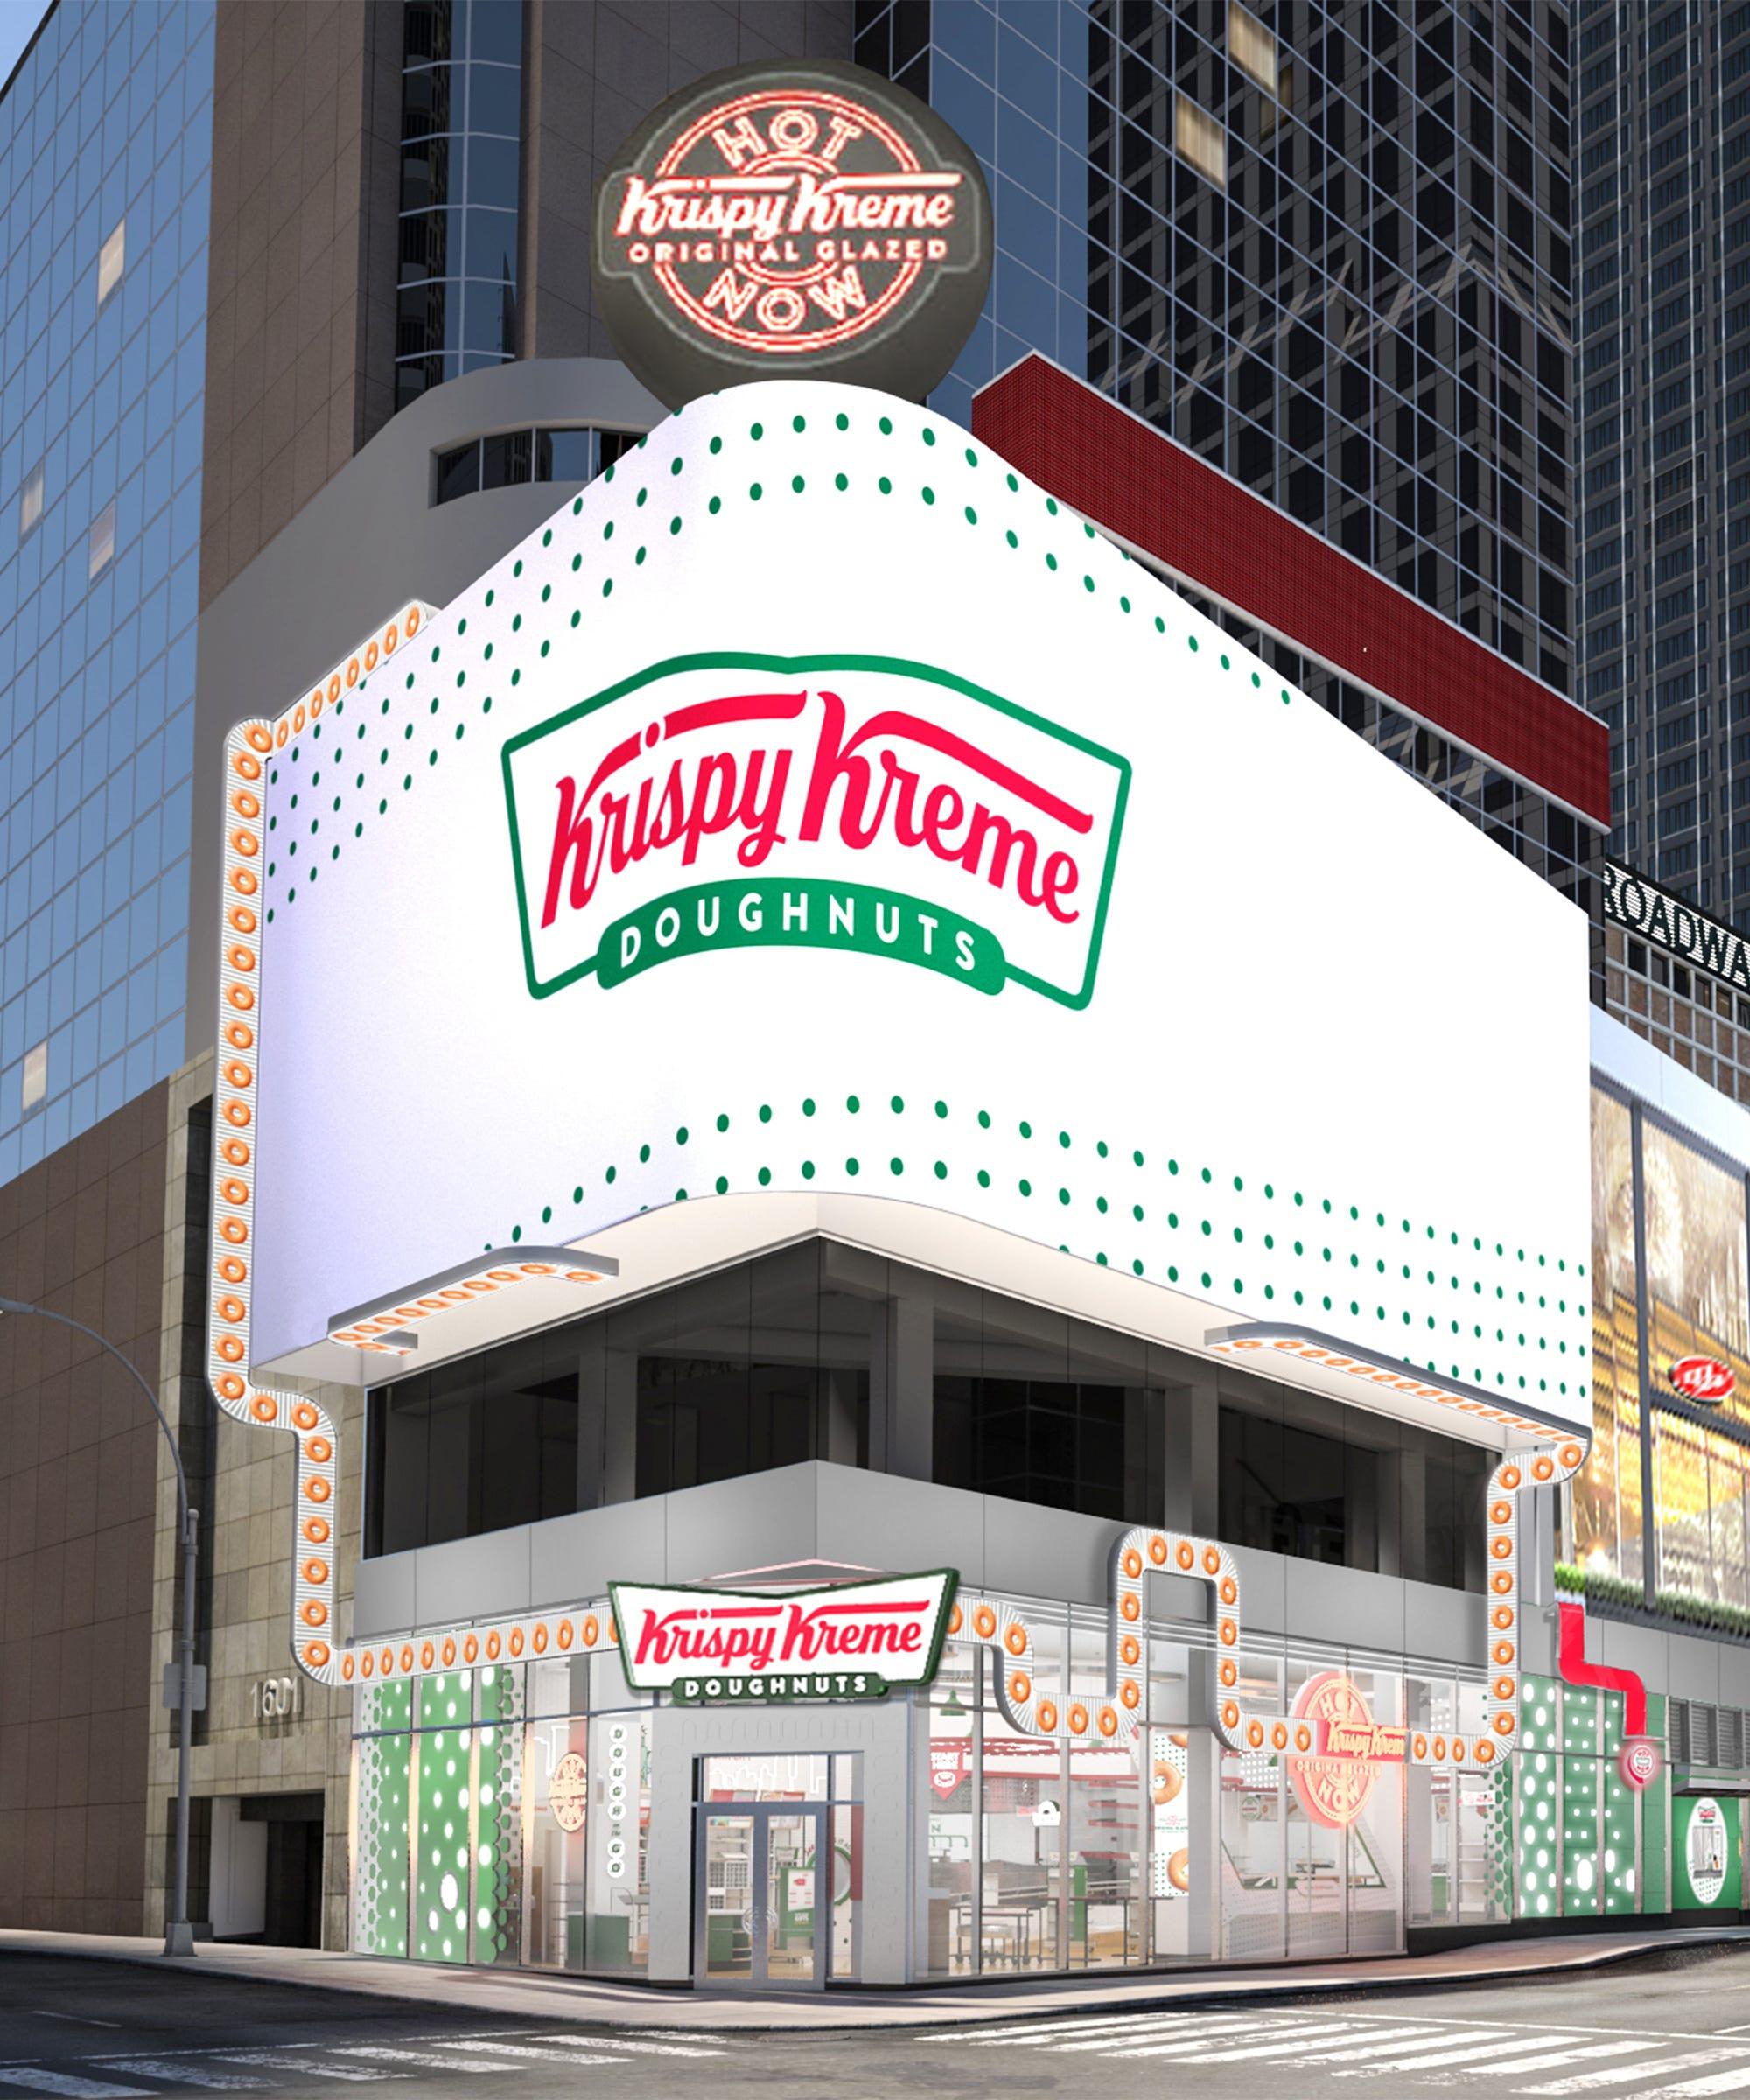 Krispy Kreme's New Times Square Megastore Will Have A Glaze Waterfall